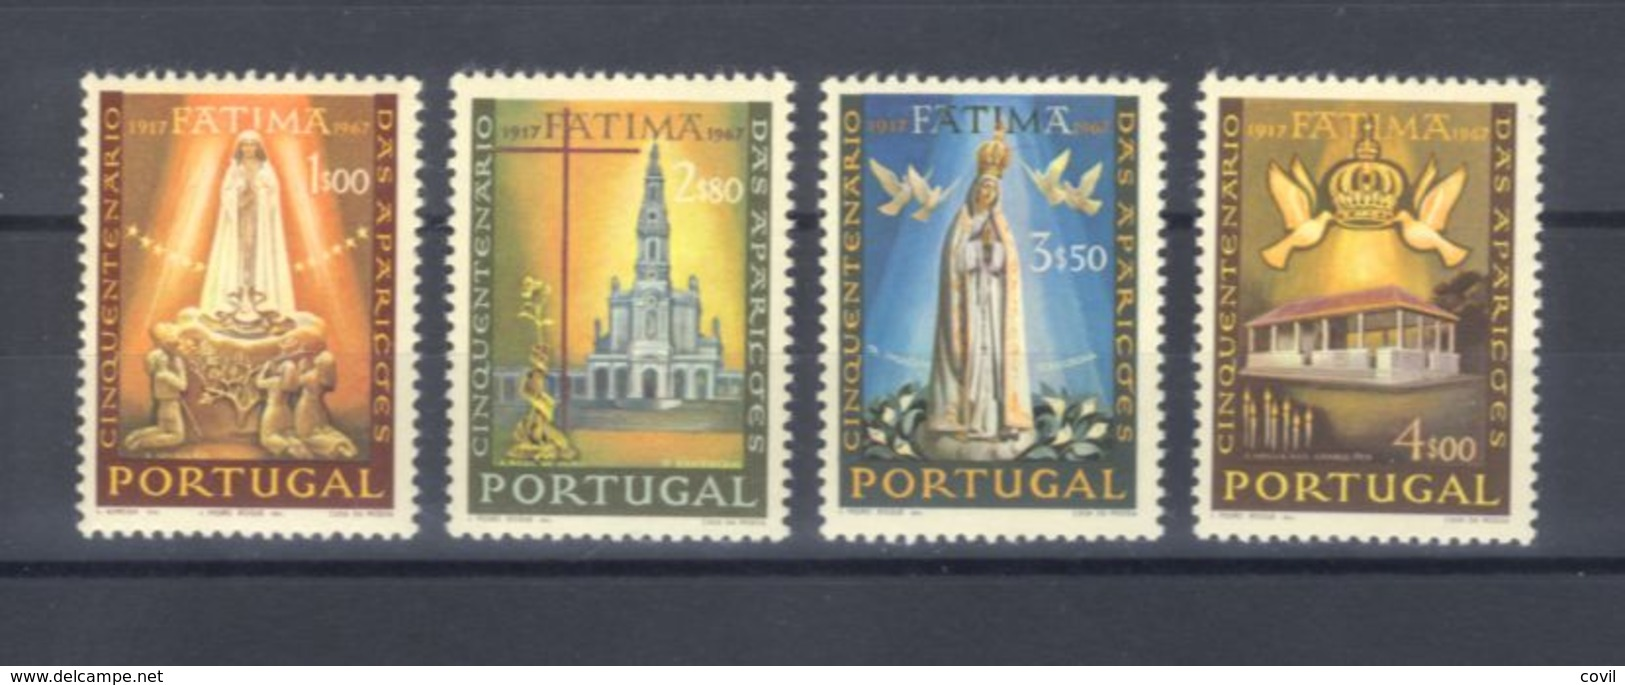 PORTUGAL 1967 Afinsa 1000/3 MNH P-38 - 1910-... República